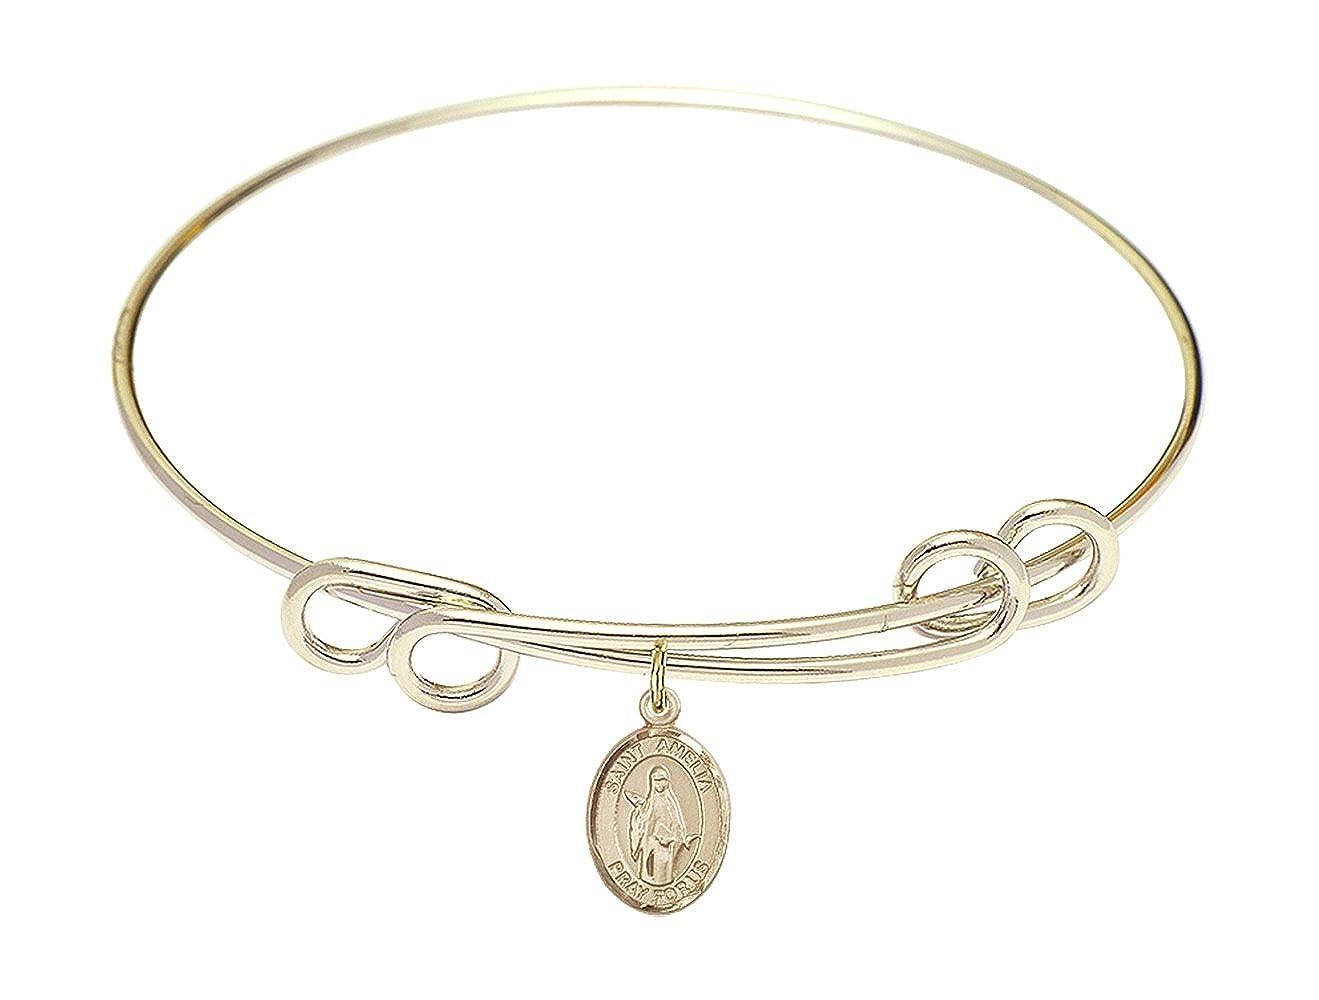 Amelia Charm. DiamondJewelryNY Double Loop Bangle Bracelet with a St